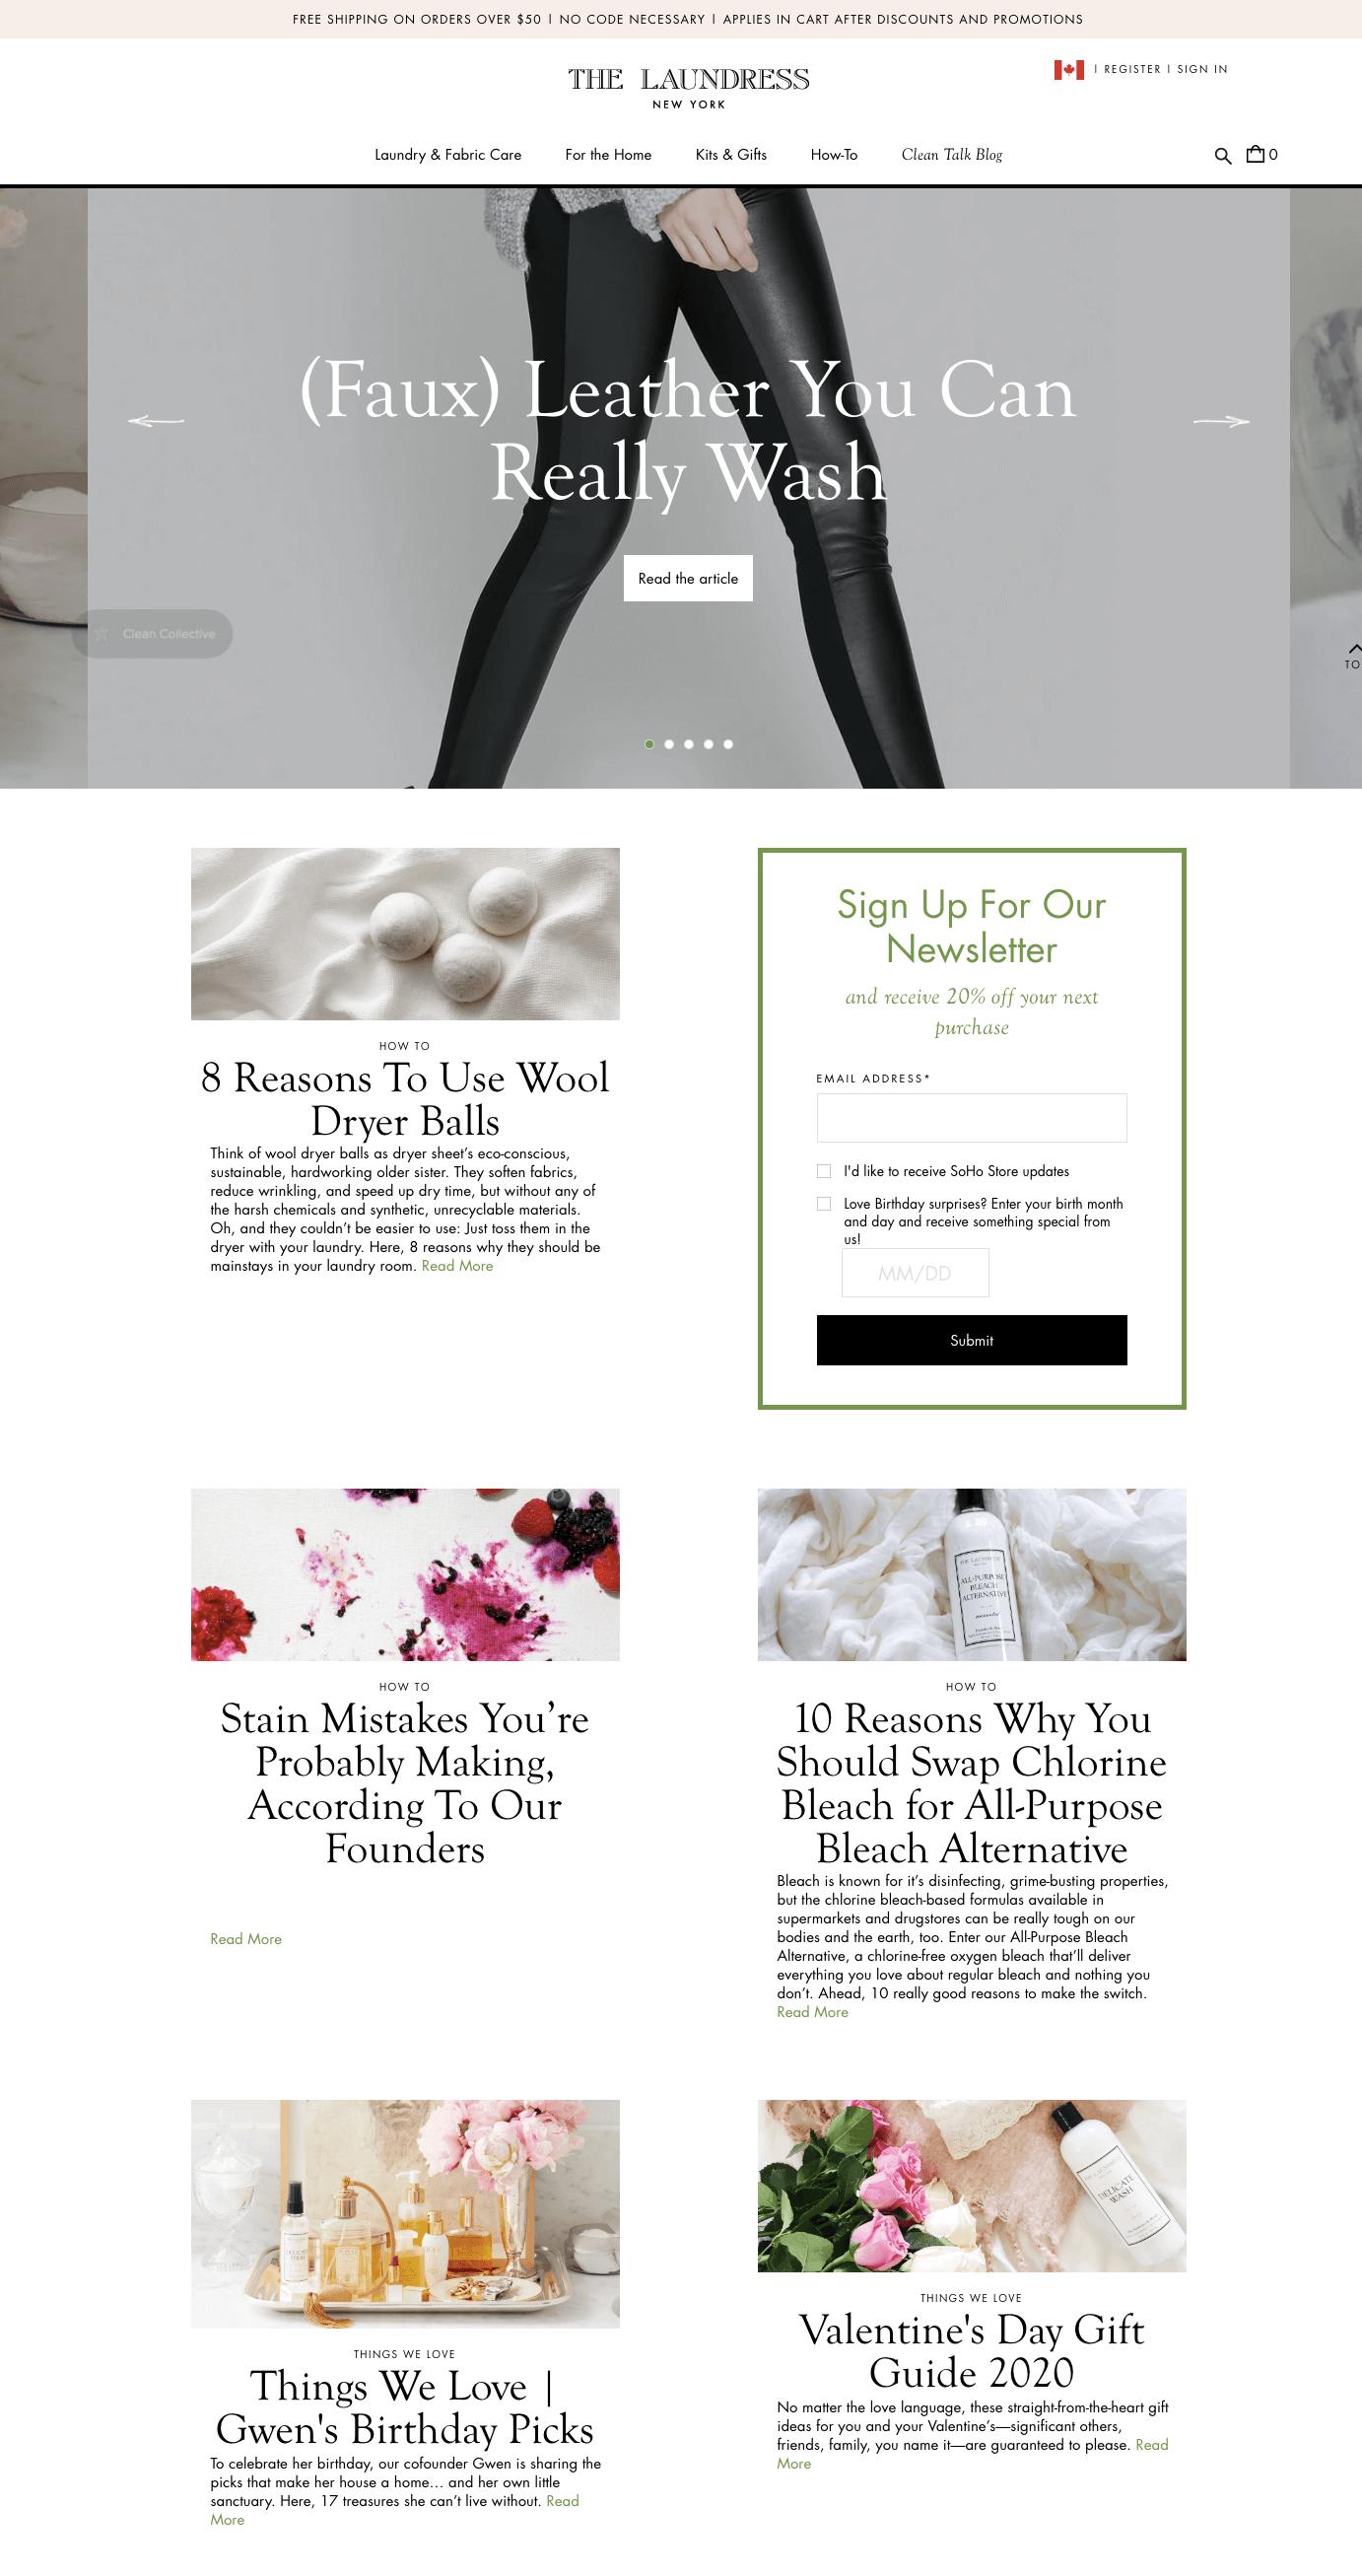 women ecommerce brands - The Laundress Clean Talk Blog